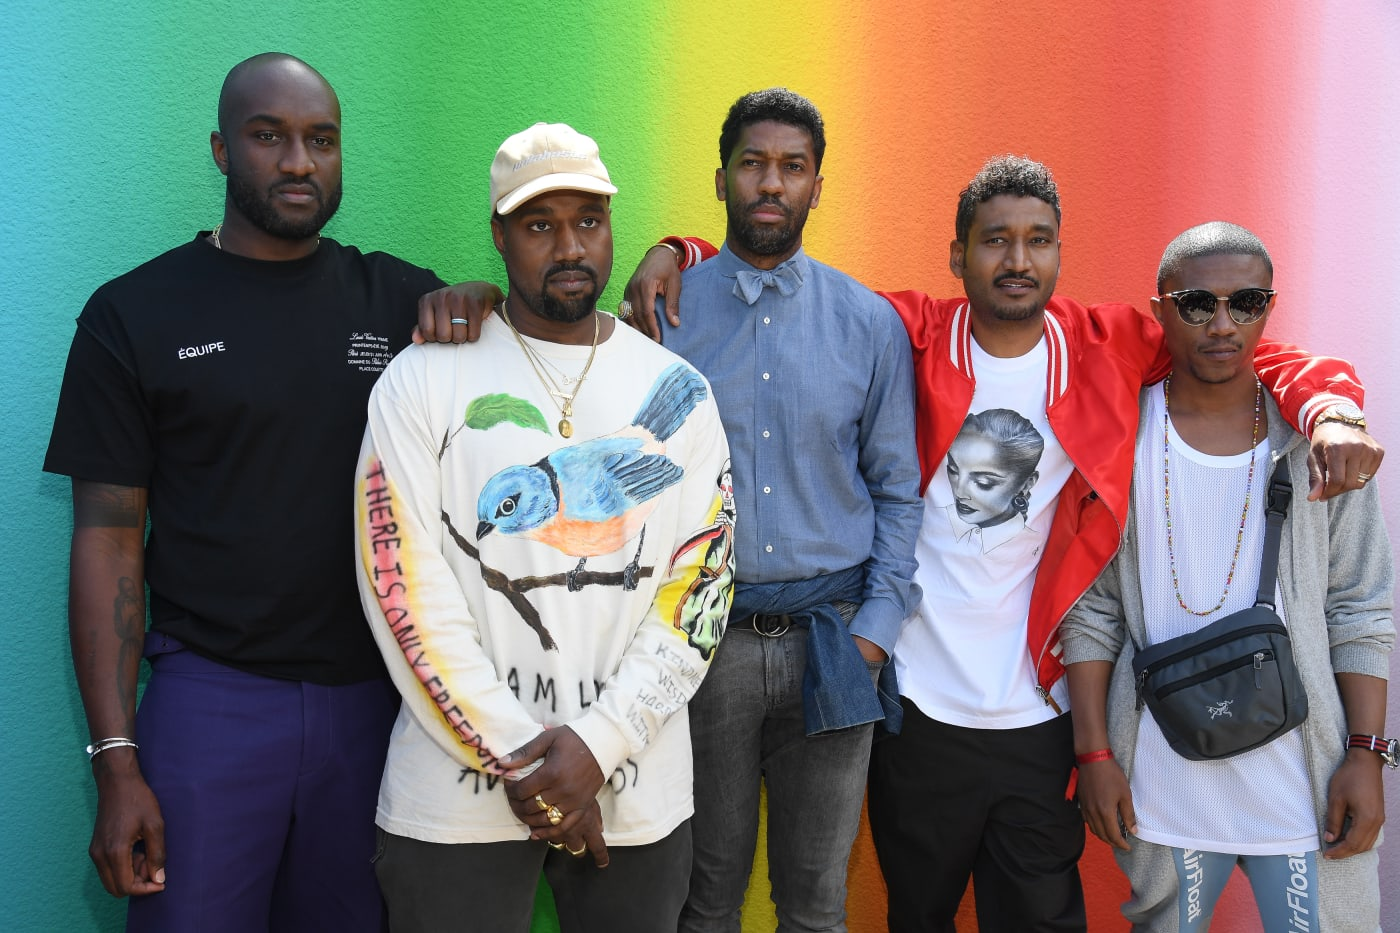 Virgil Abloh, Kanye West, Fonzworth Bentley, Don C, Ibn Jasper